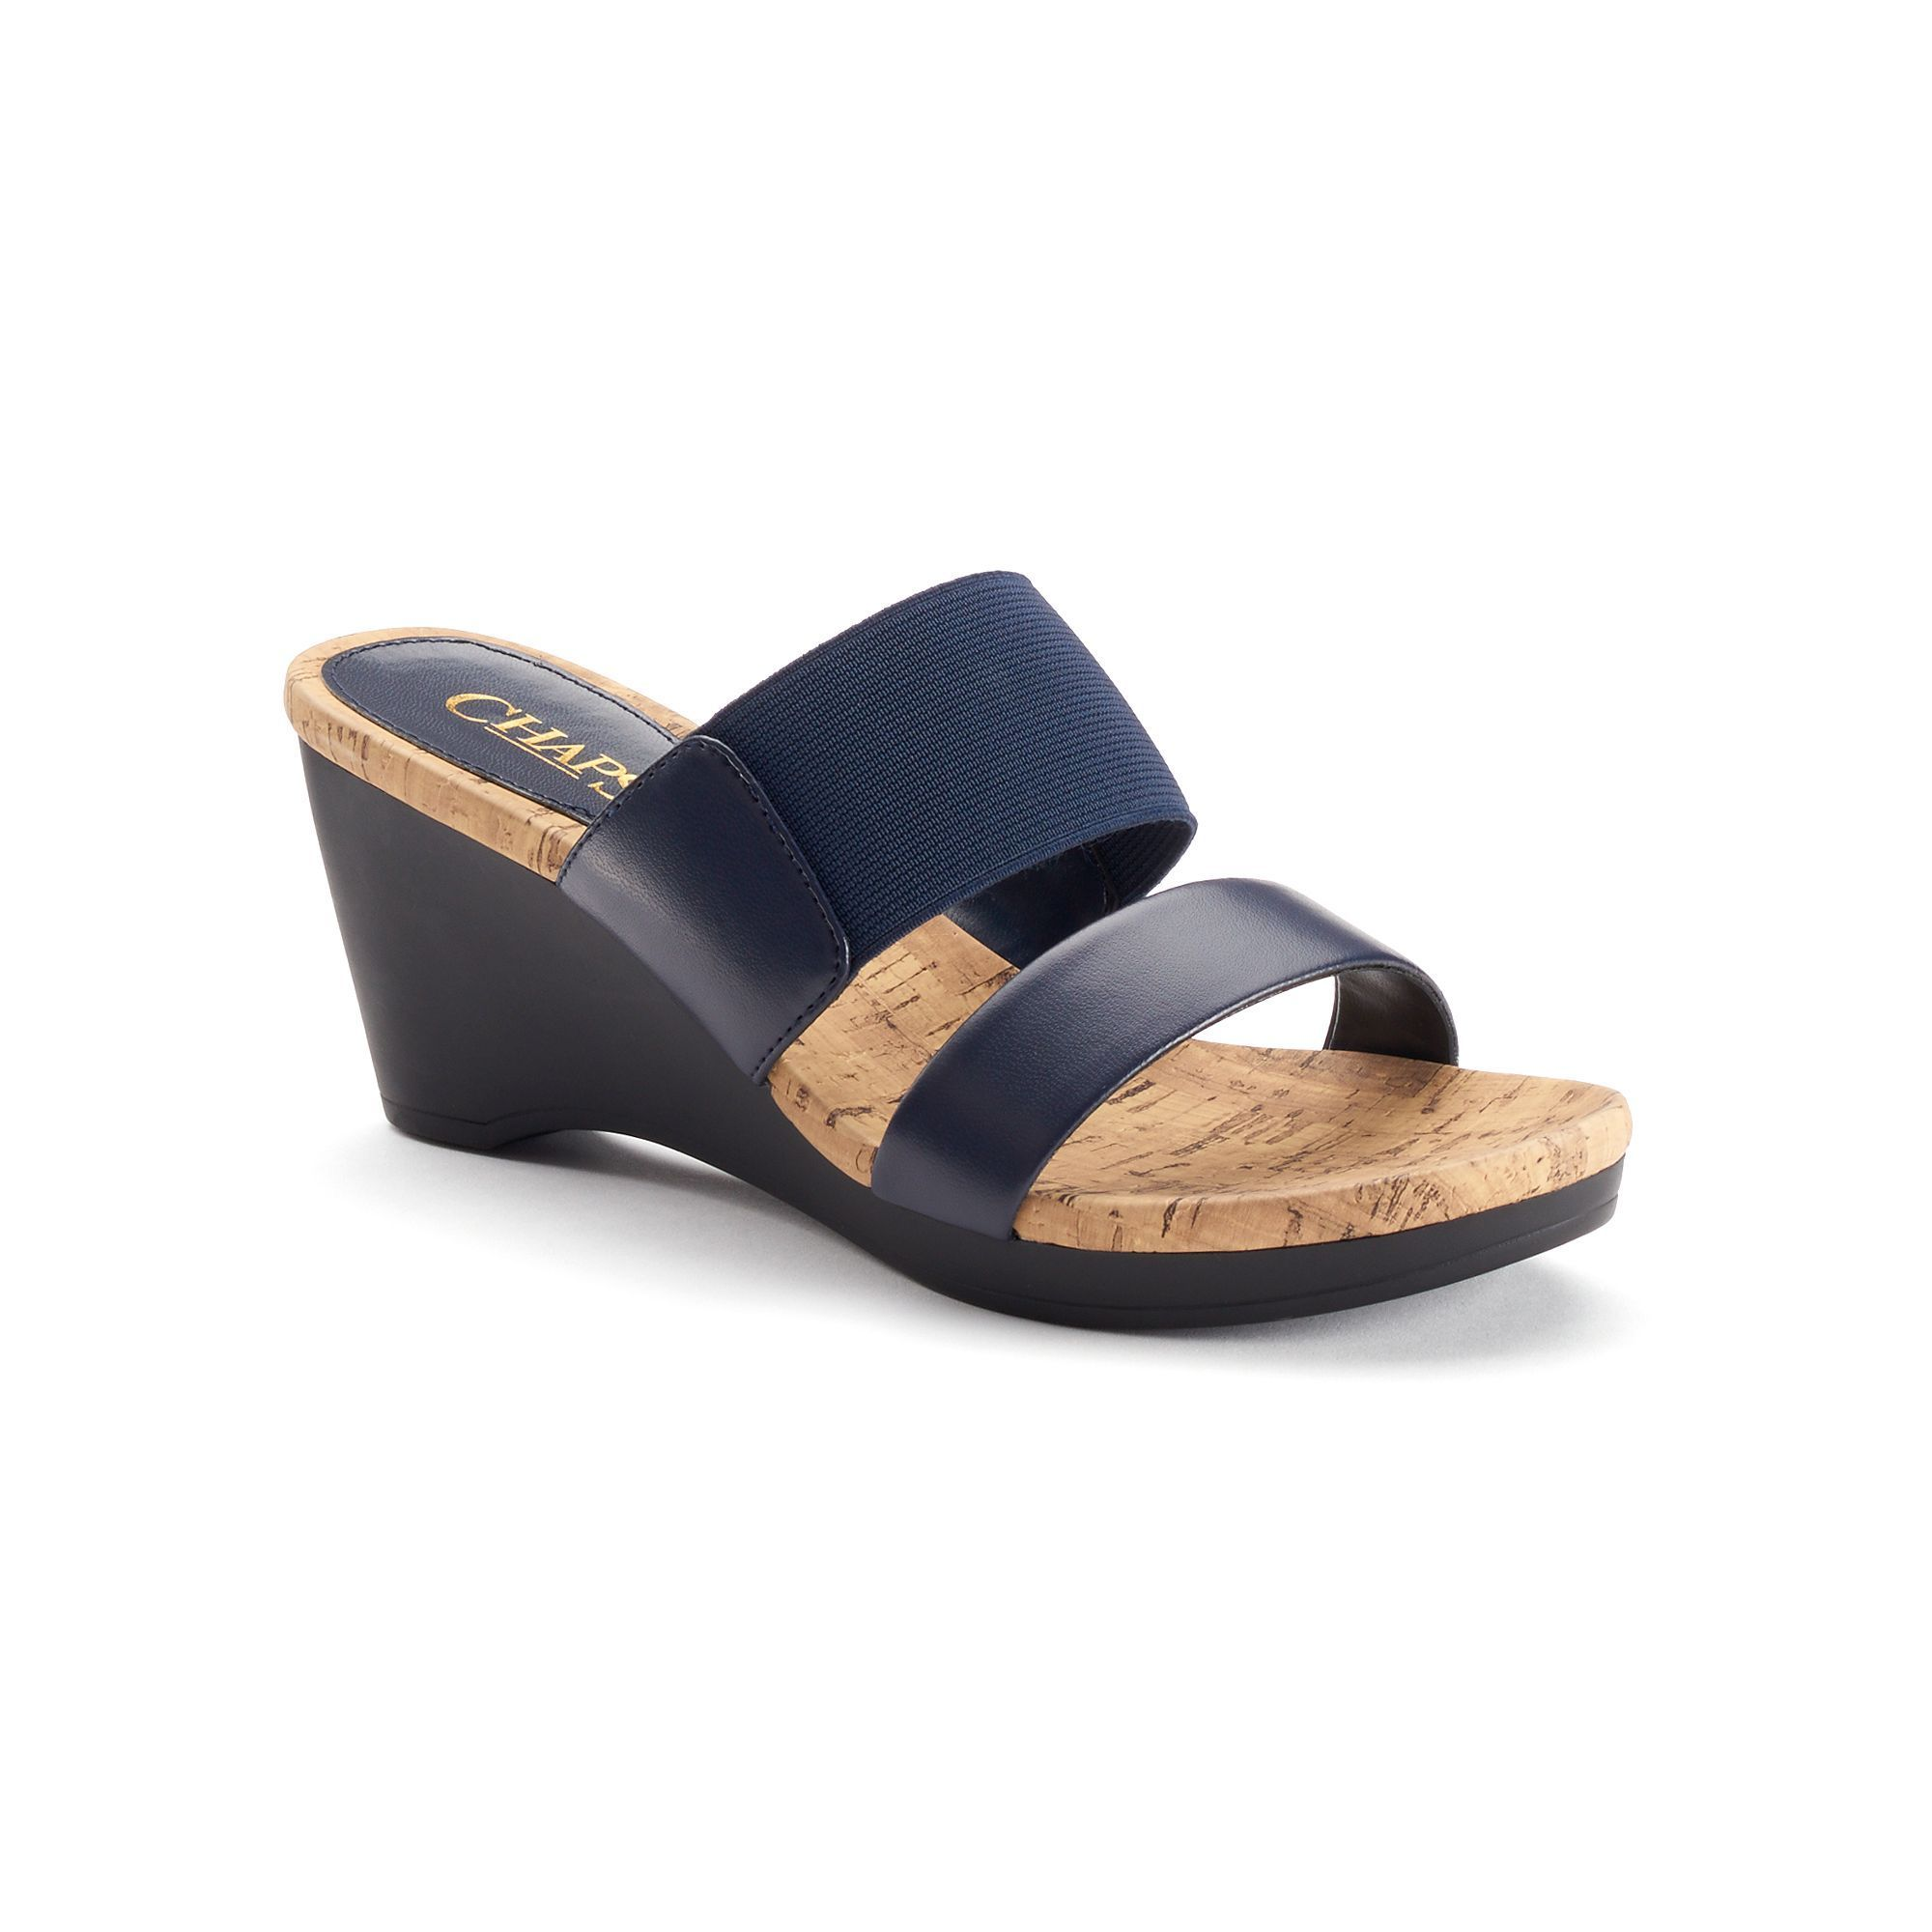 9f2f84eb402c Chaps Rhoda Women s Slip-On Wedge Dress Sandals in 2019